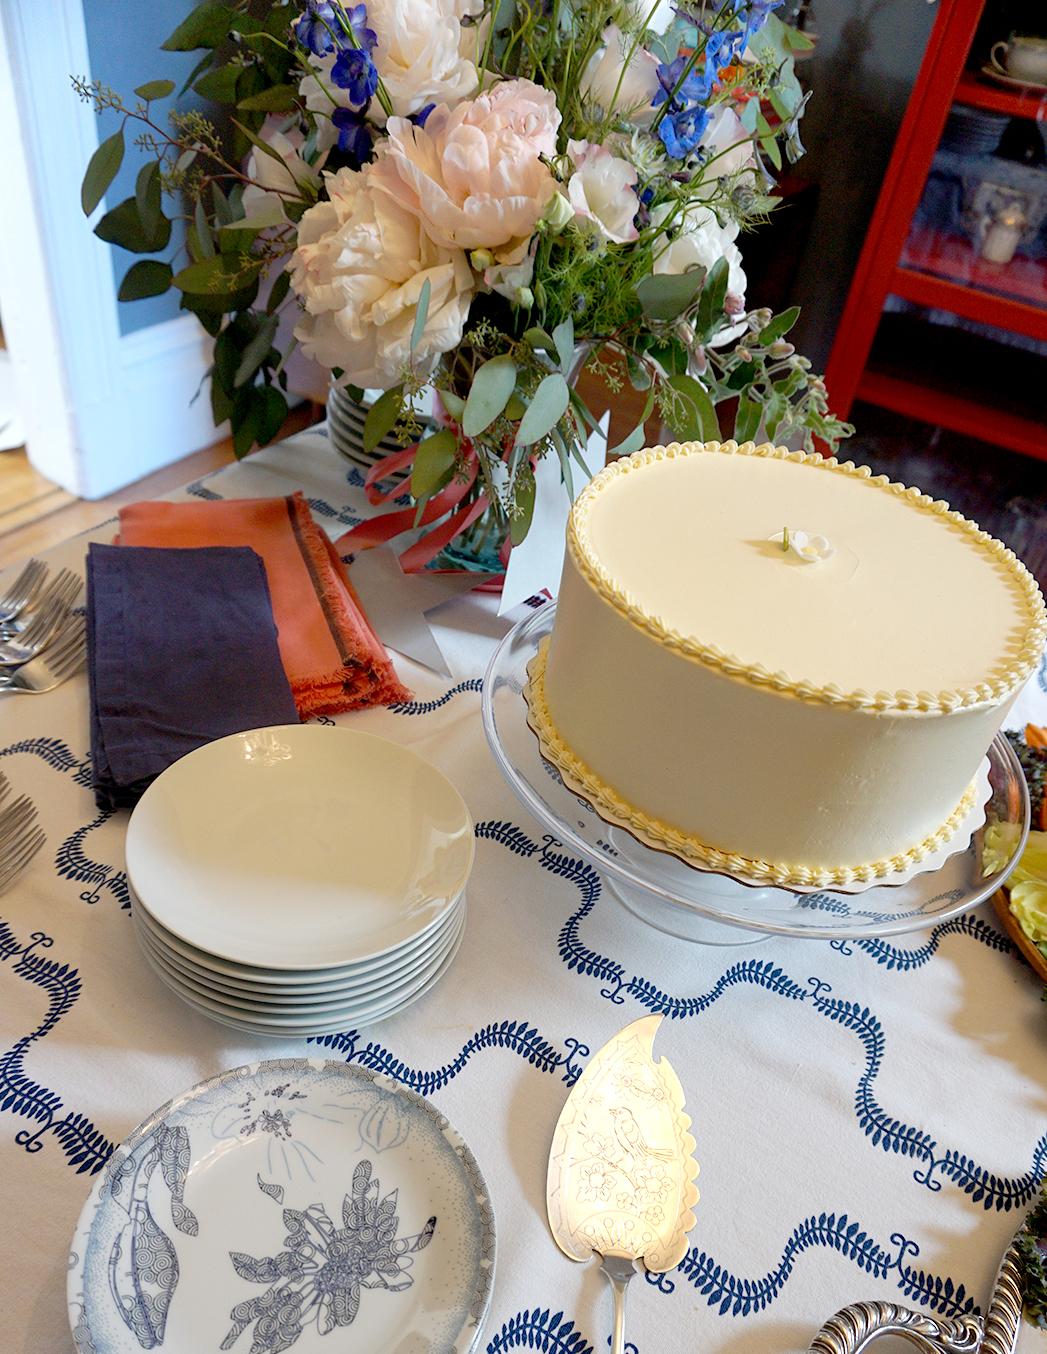 Miette lemon cake